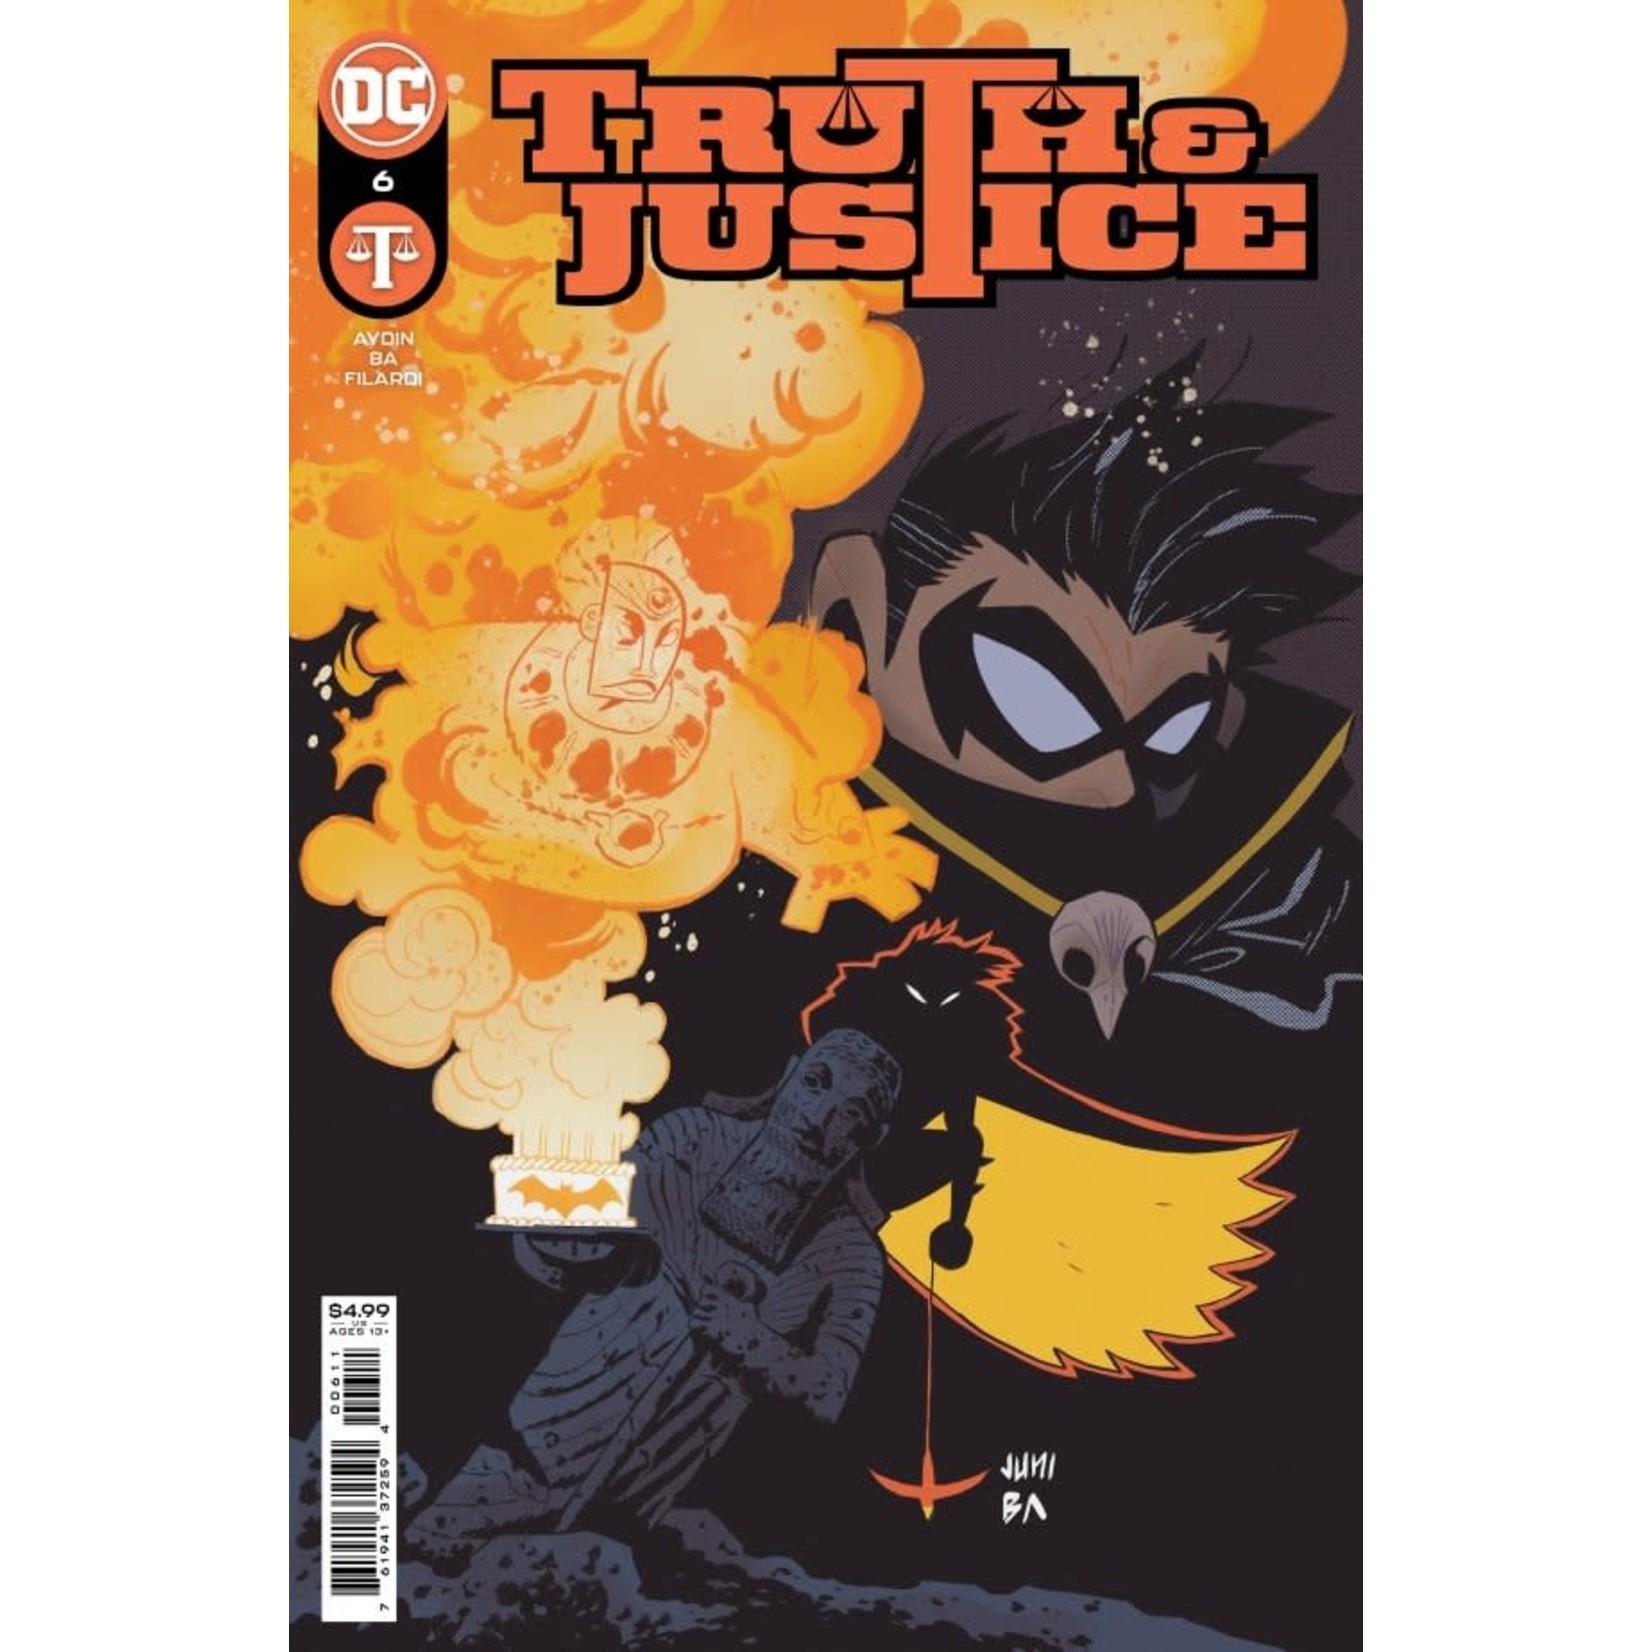 DC Comics TRUTH & JUSTICE #6